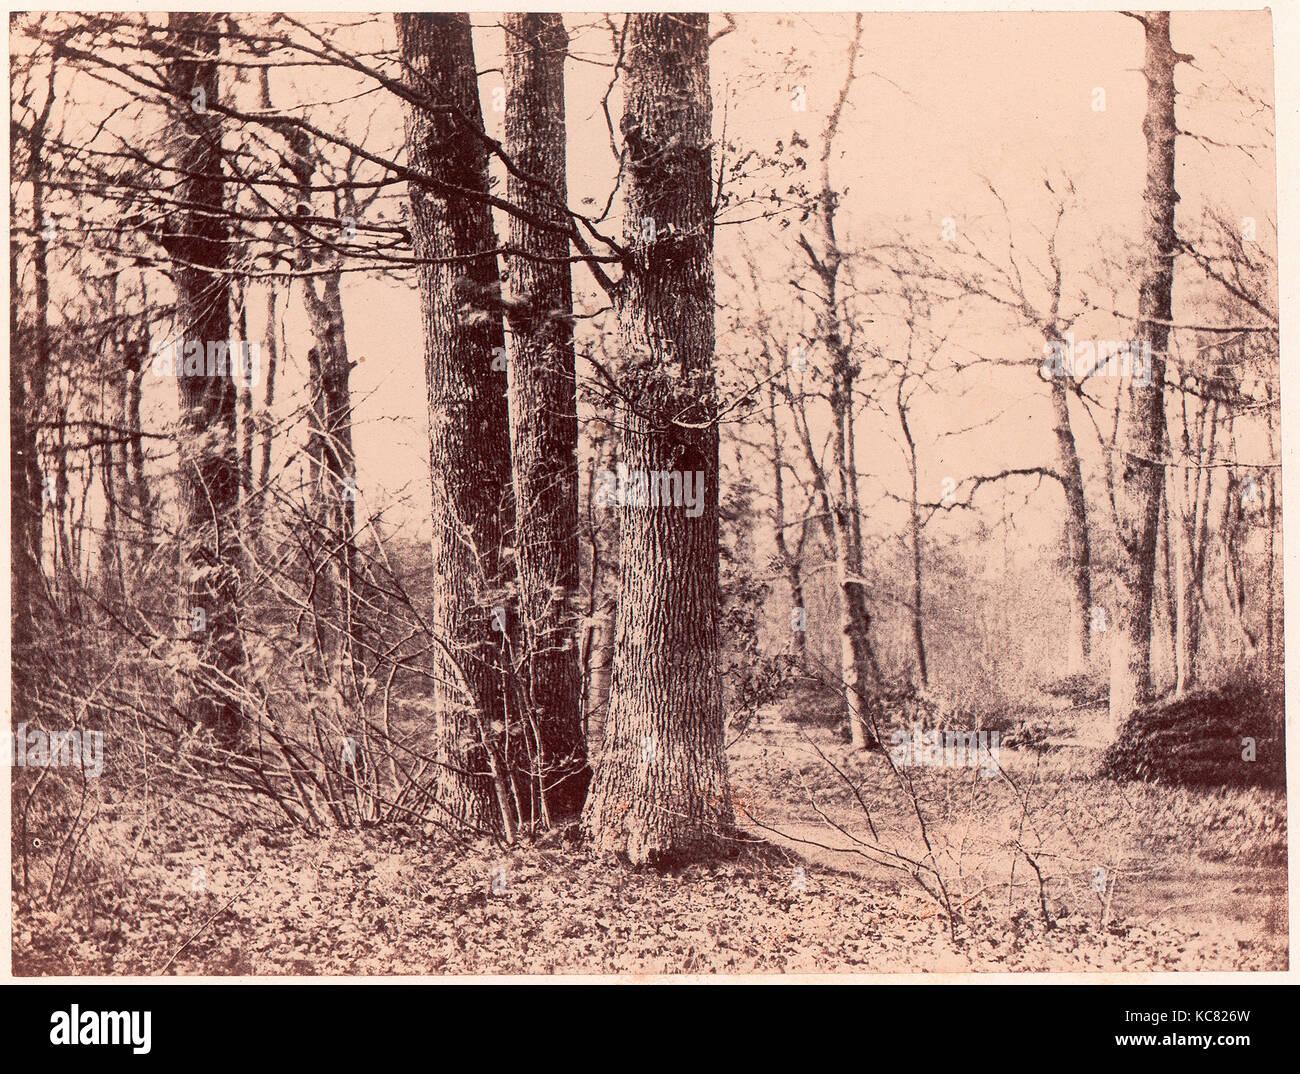 Sous-bois en automne, 1850–53, Salted paper print (Blanquart-Évrard process) from paper negative, Photographs, - Stock Image